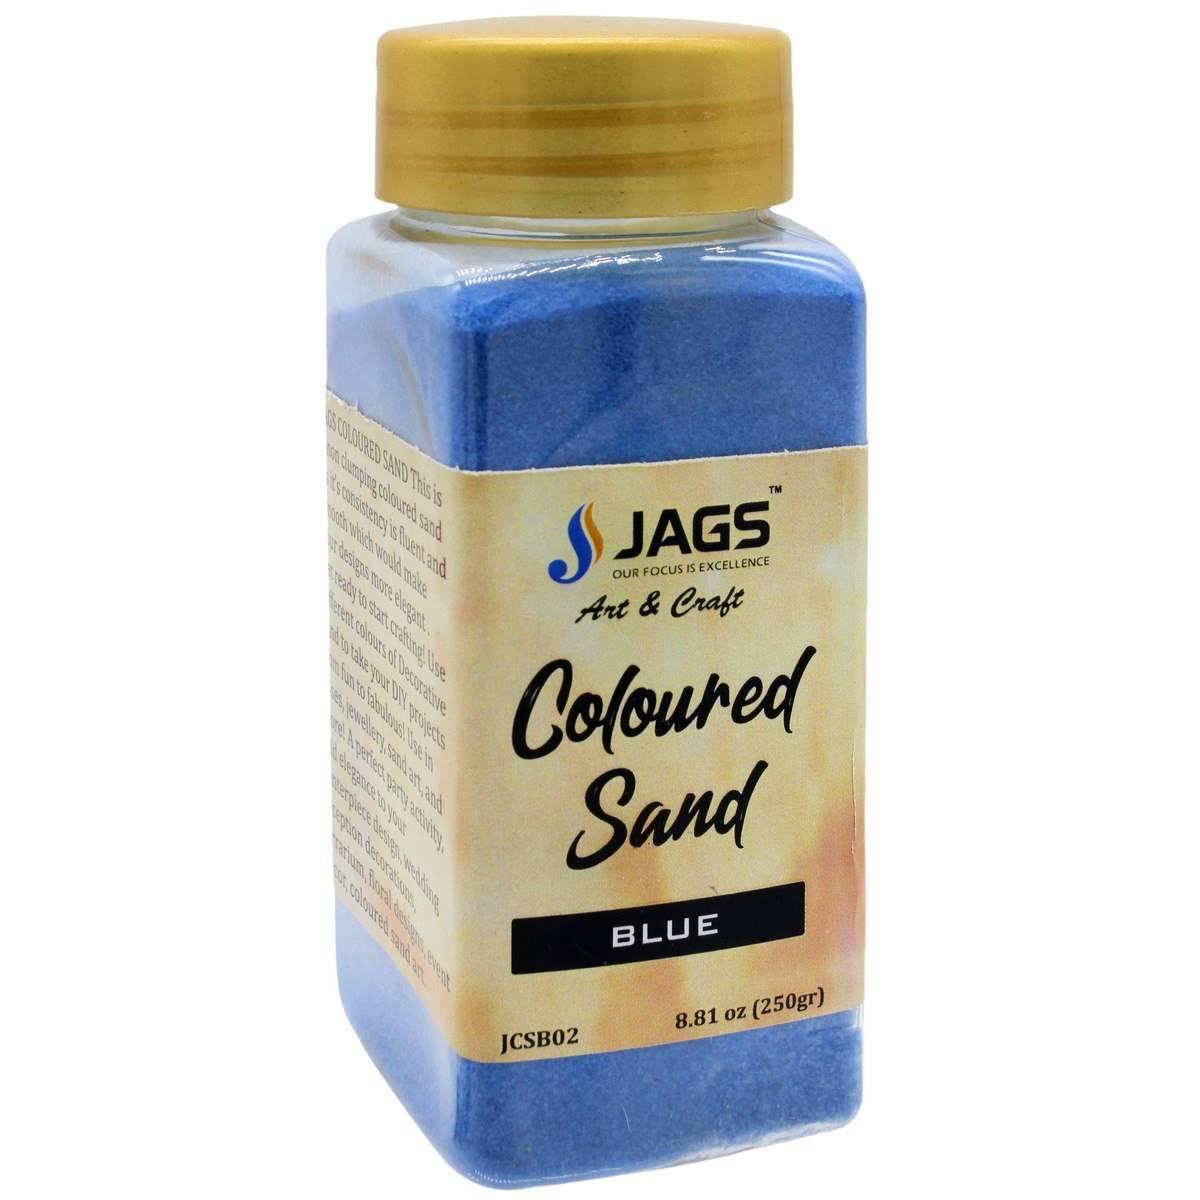 Coloured Sand Blue